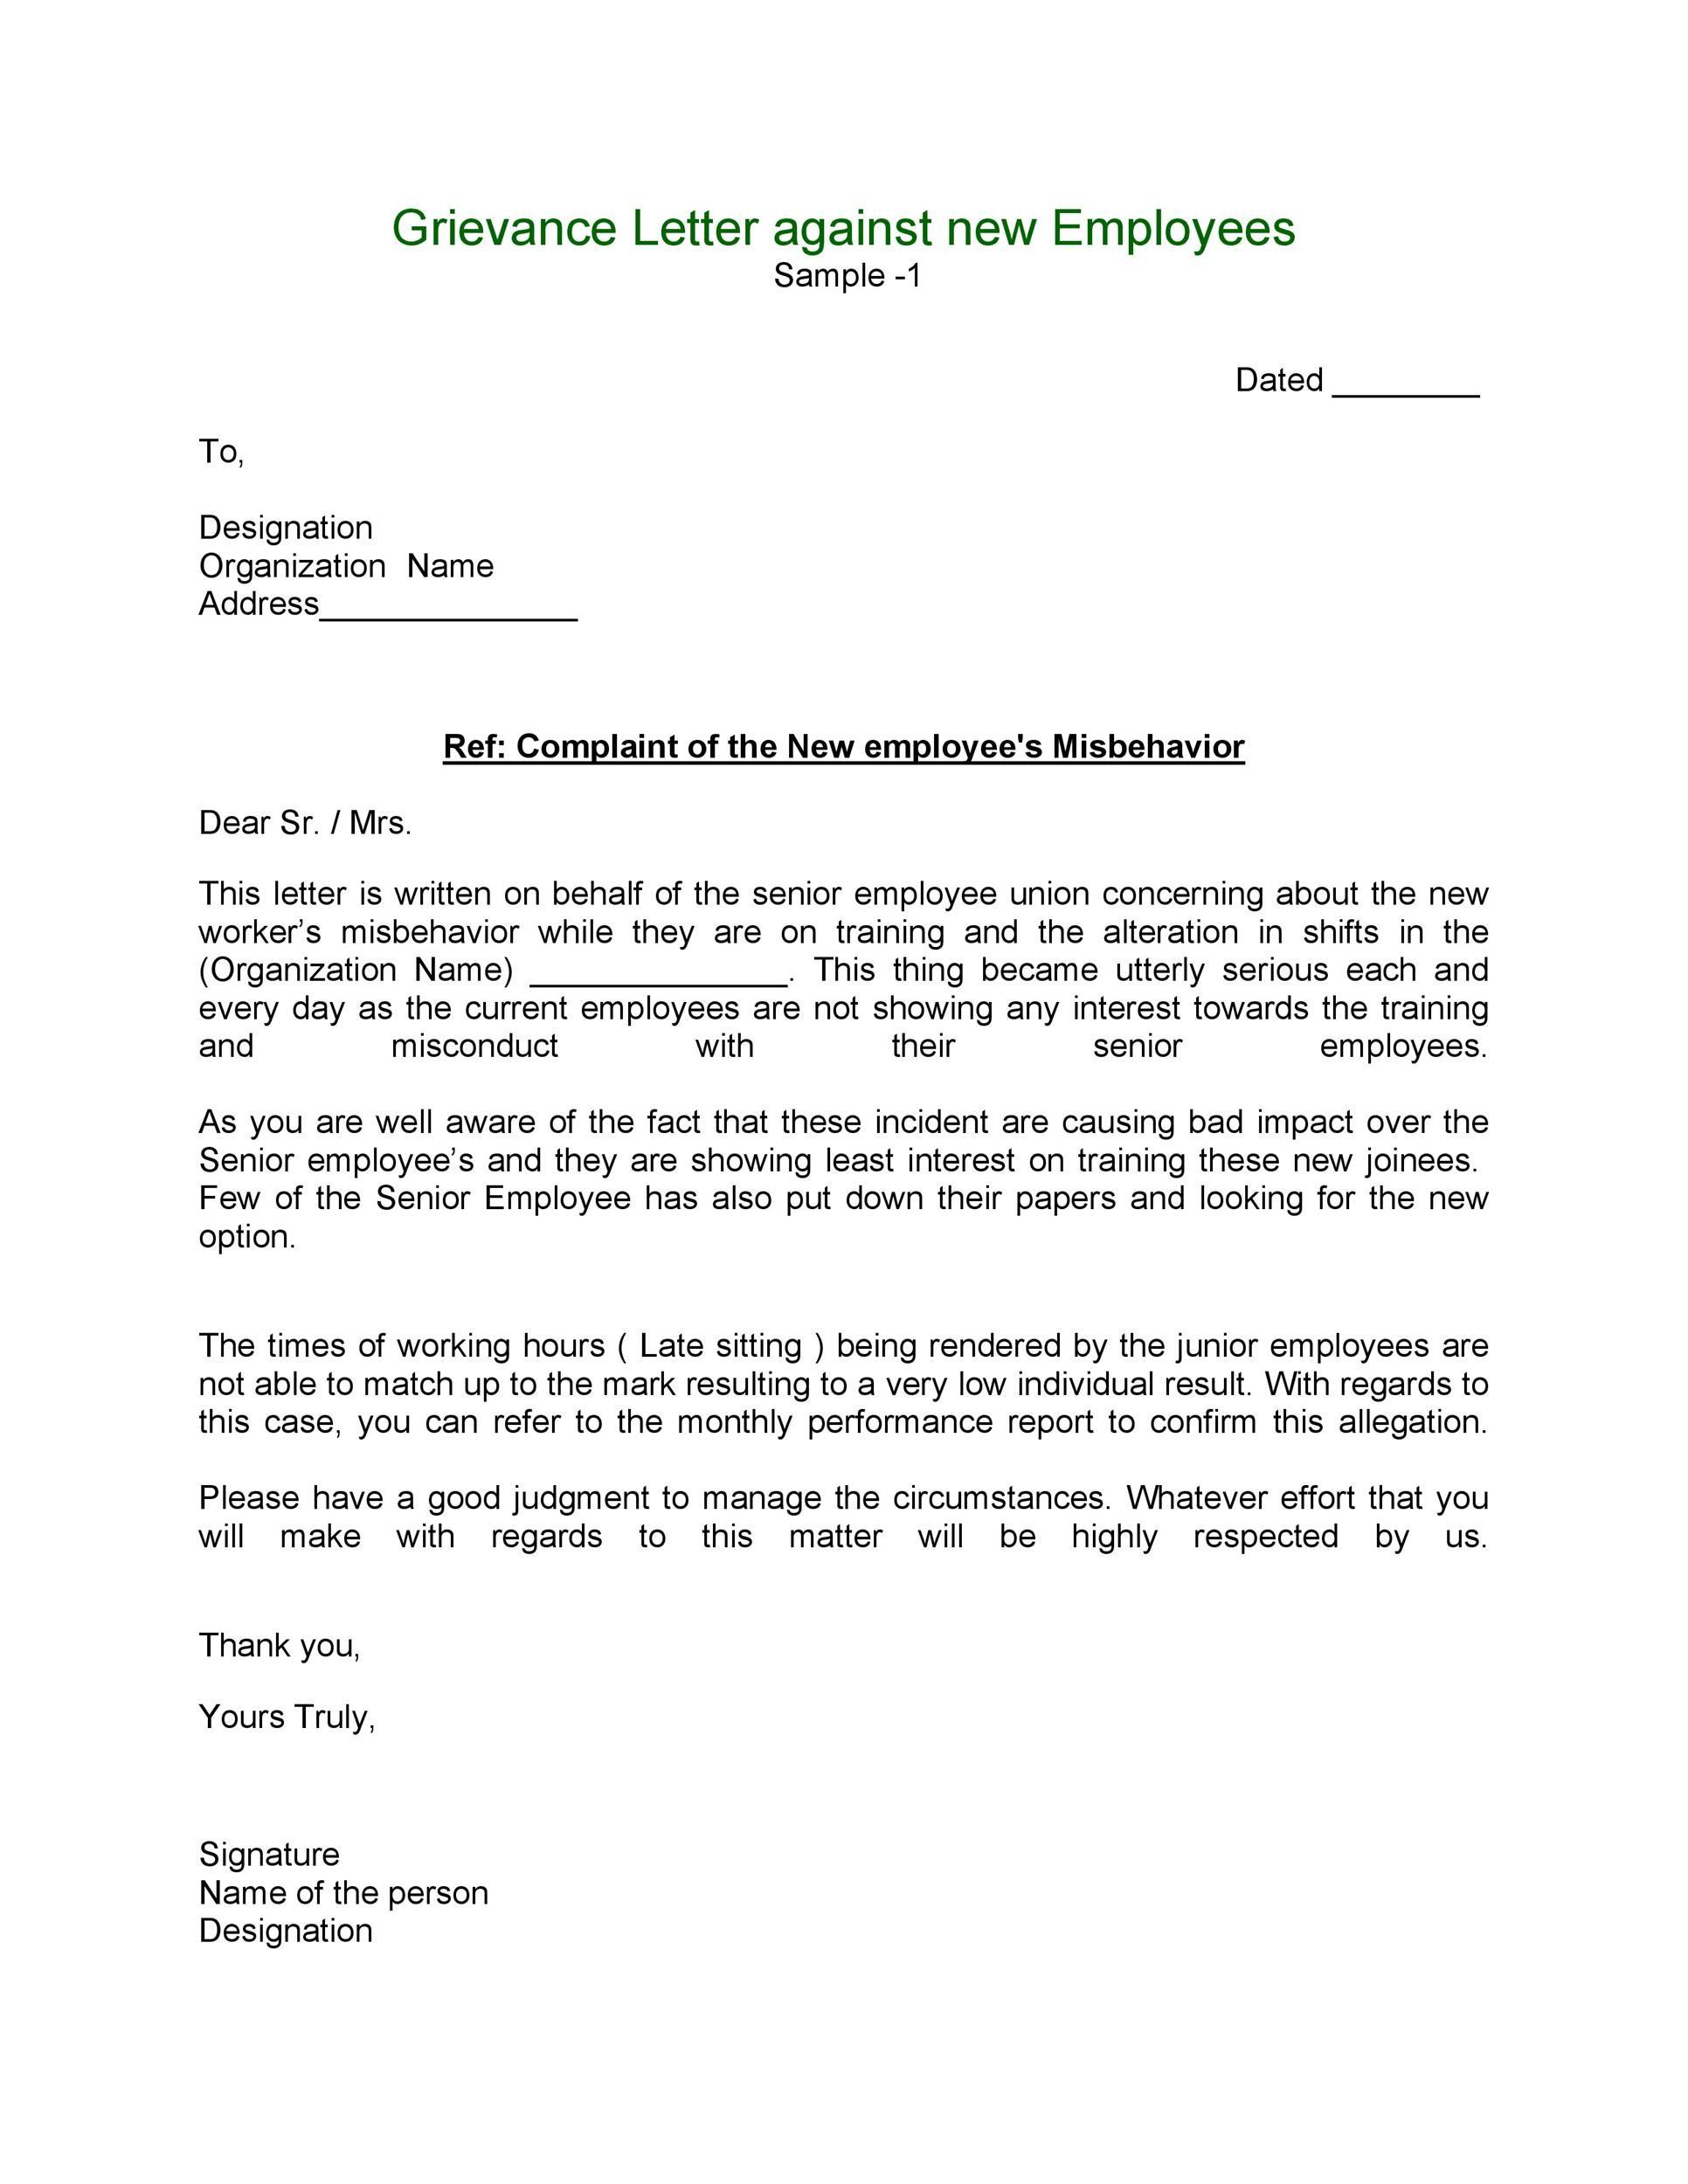 Sample Grievance Letter For Unfair Treatment from templatelab.com